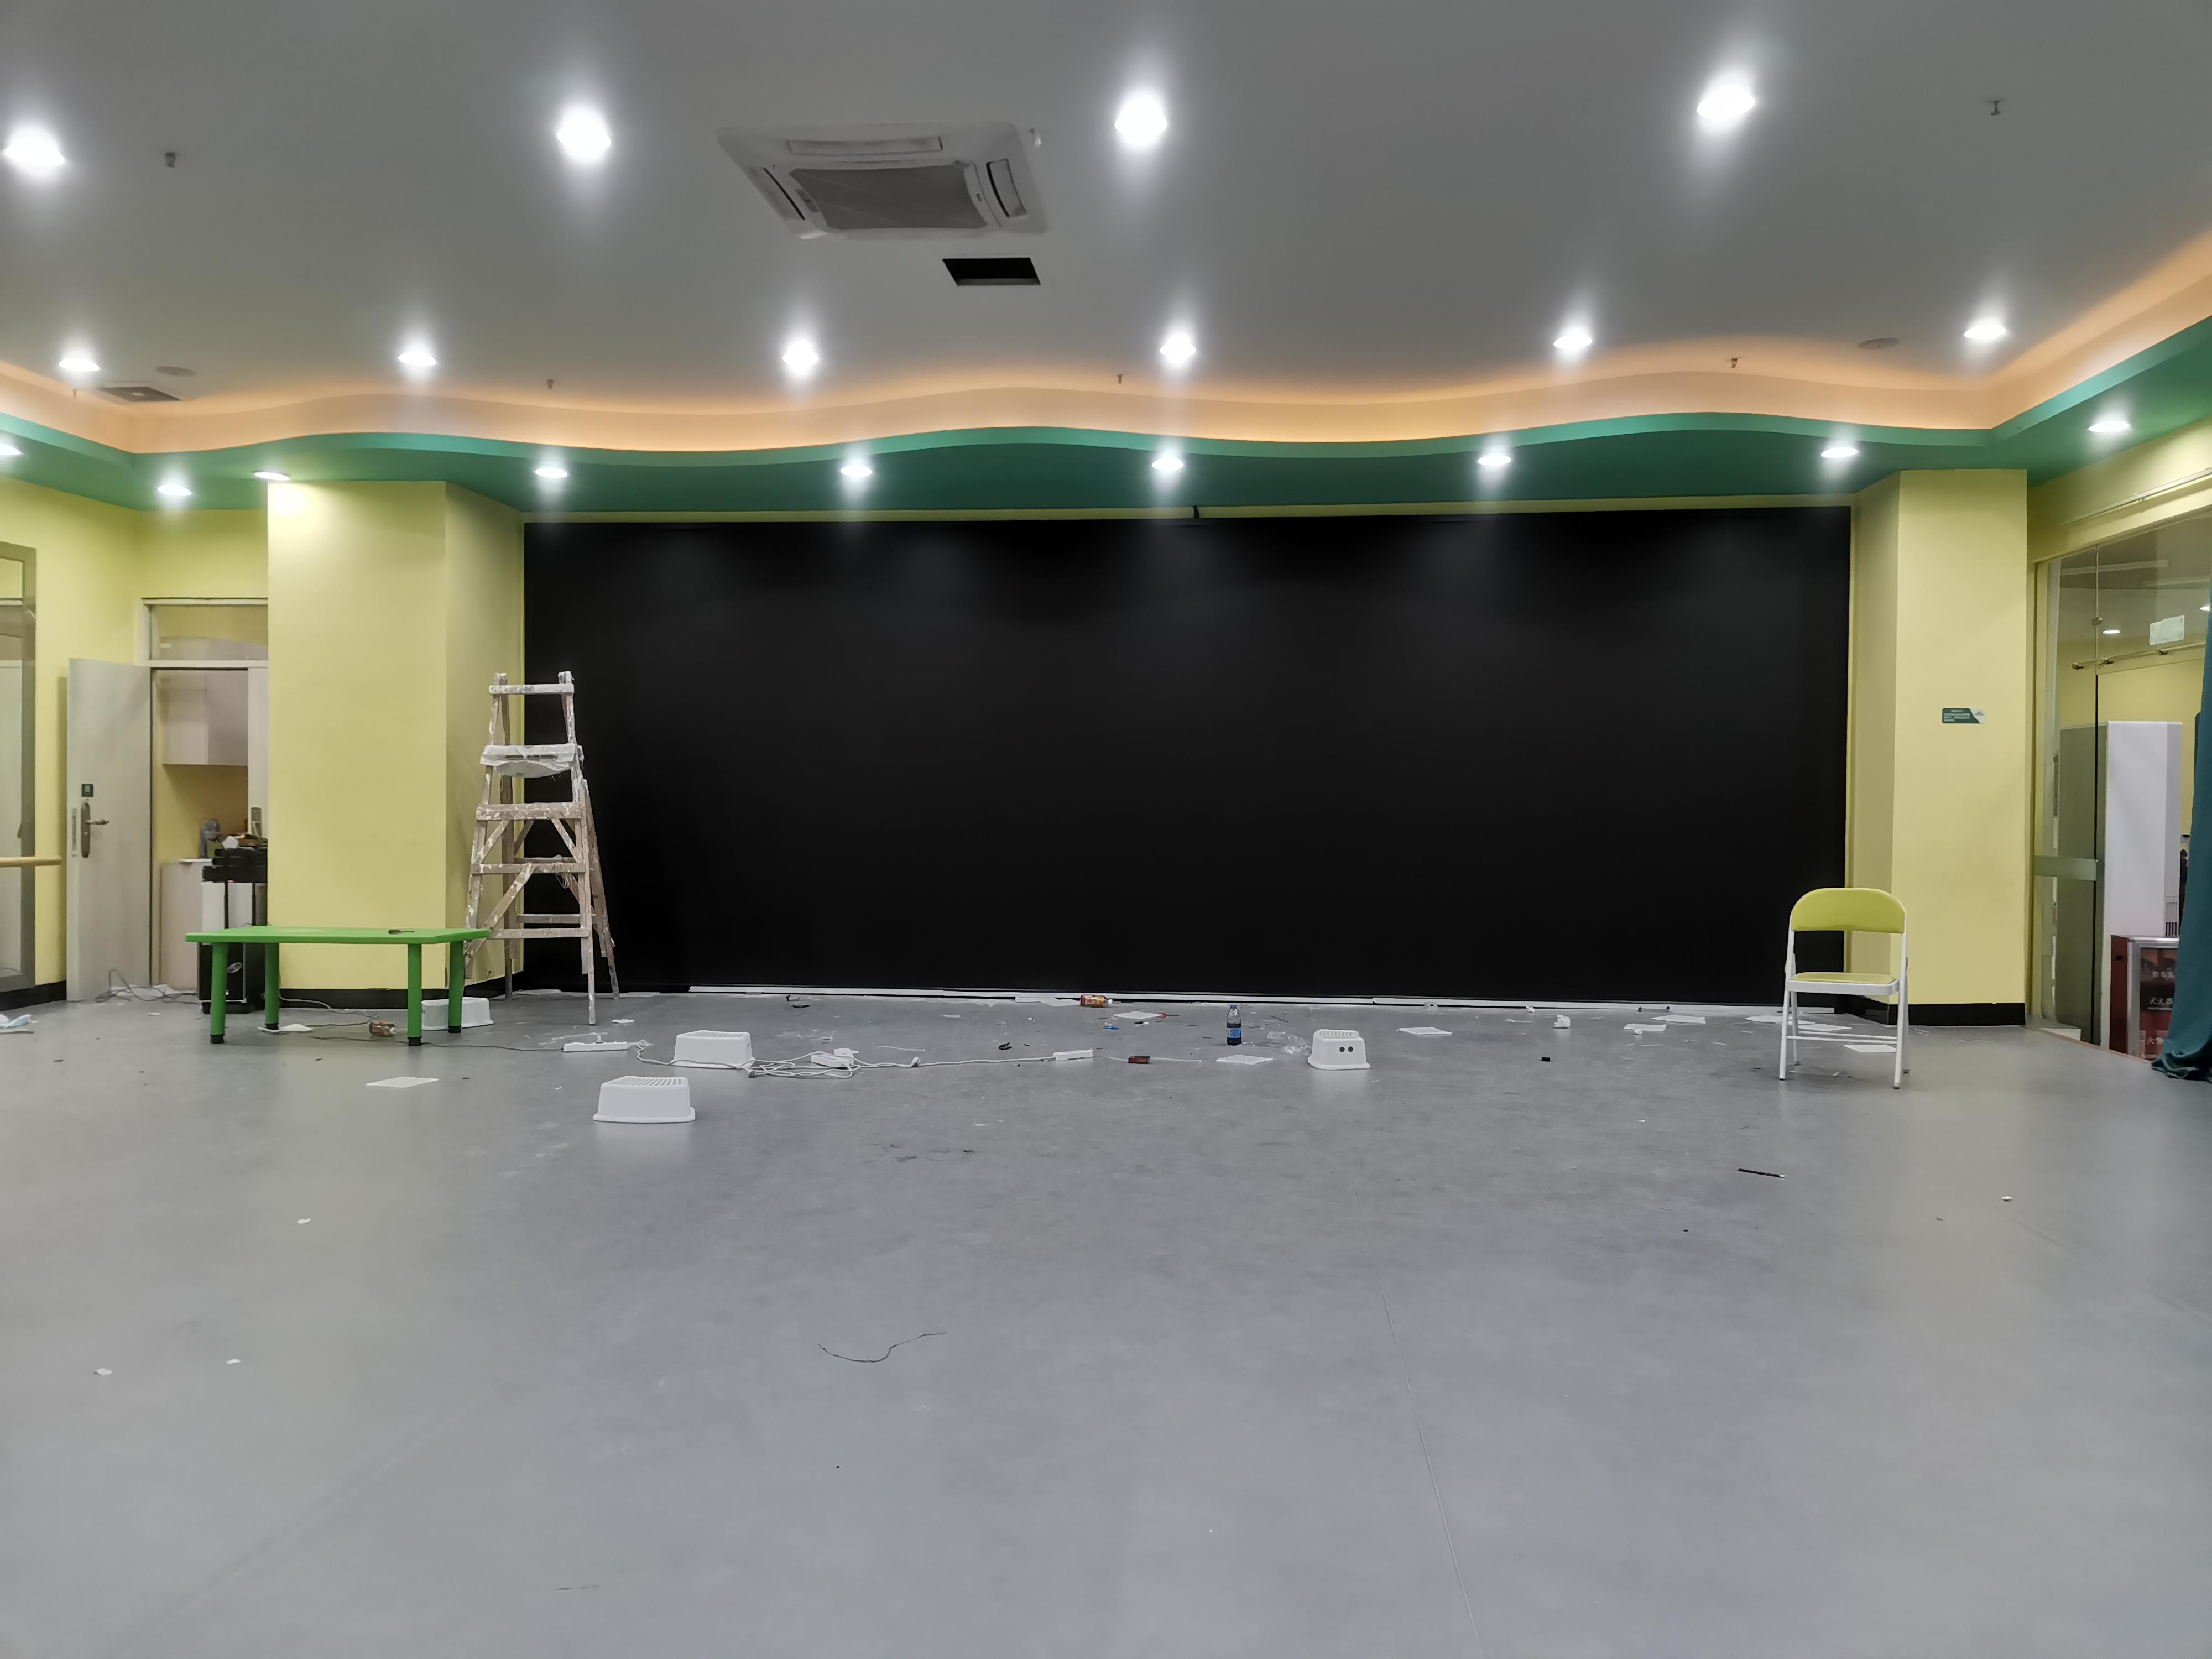 <b><font color='#0000FF'>佛山南海舞蹈室演播厅P3项目</font></b>